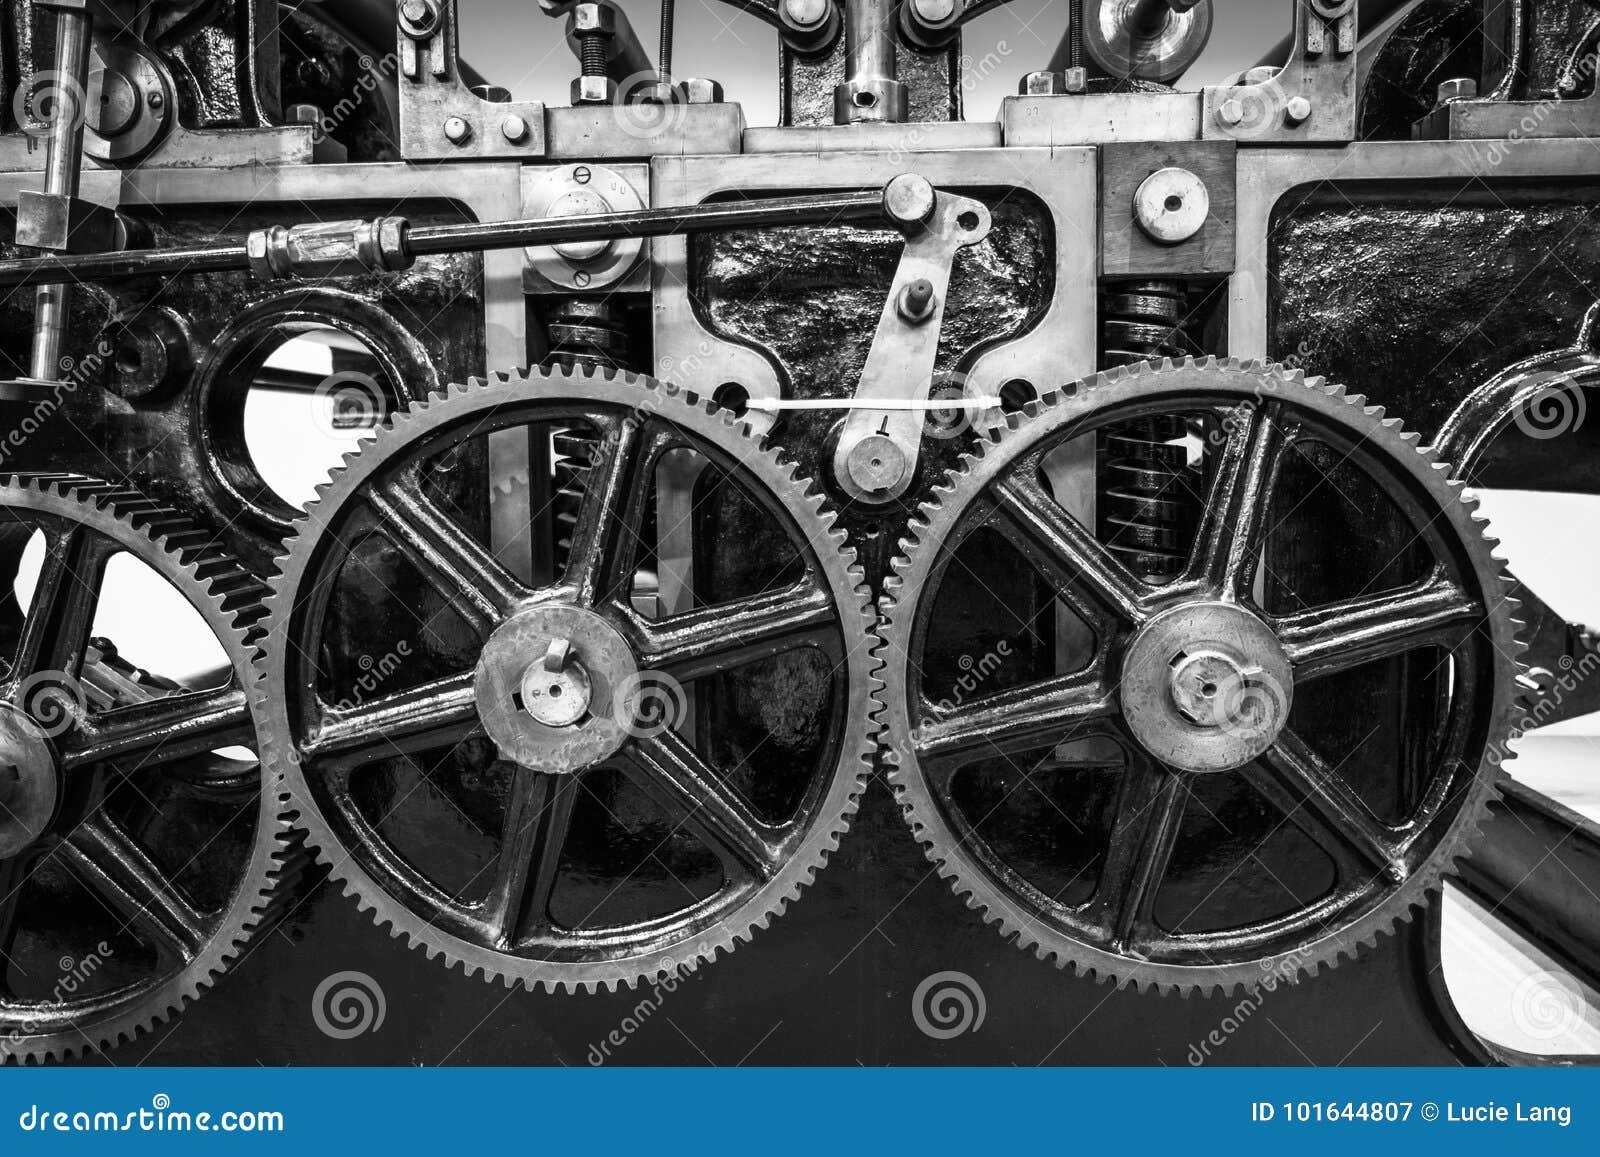 Industrial machine cogs.